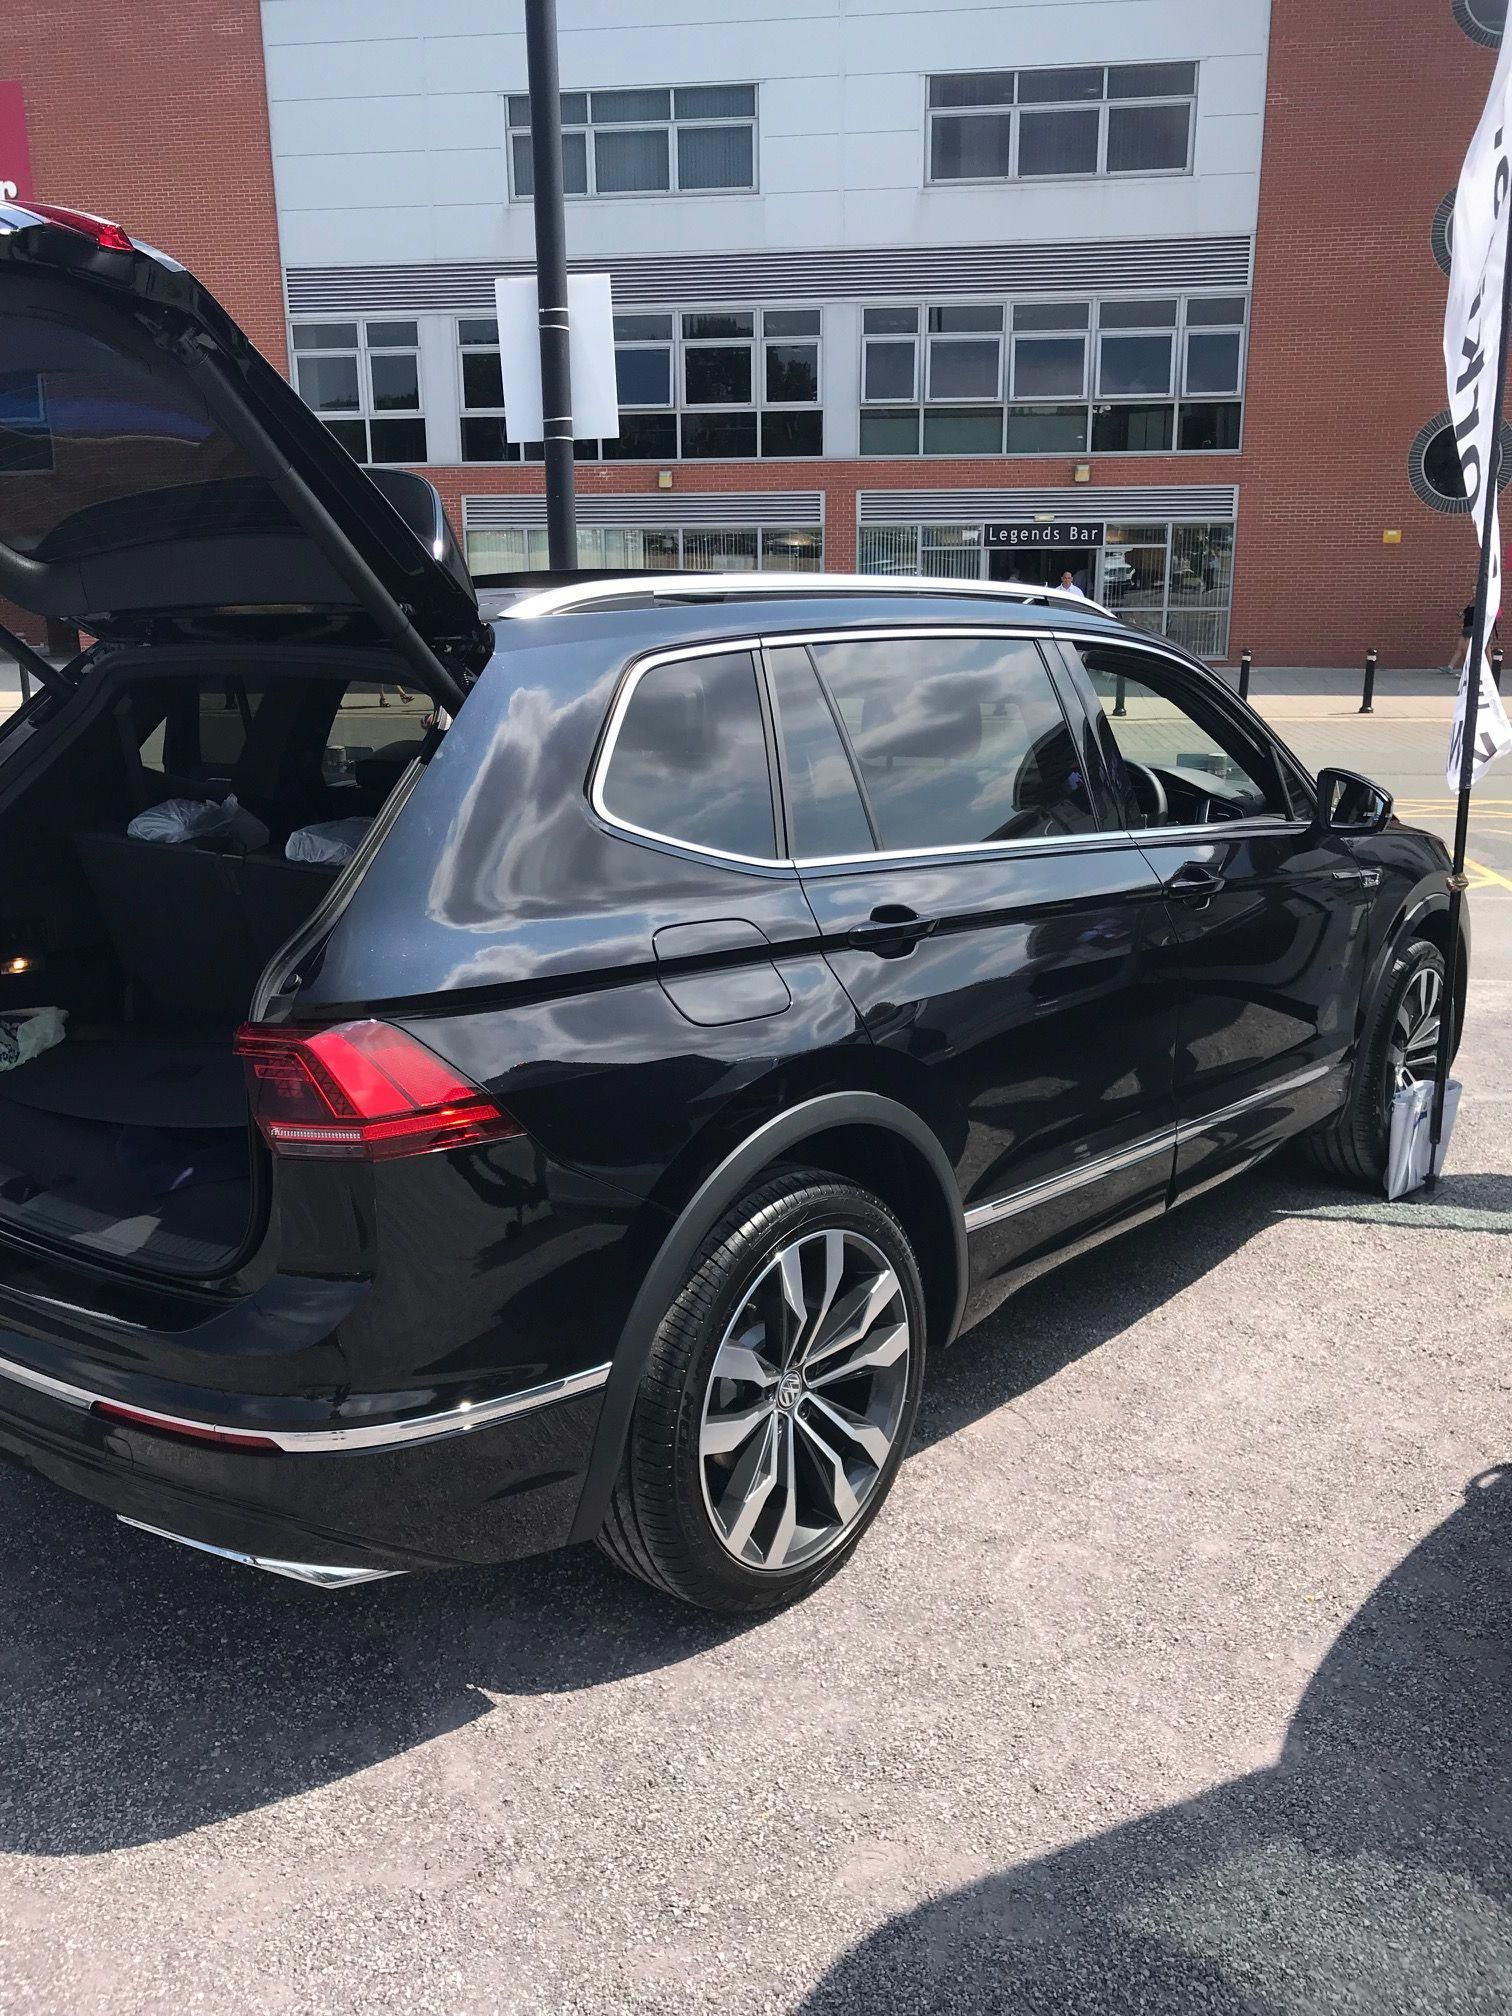 Volkswagen Tiguan Allspace Diesel Estate 2 0 Tdi R Line 5dr Dsg Car Leasing Deal Carleasing Vw Tiguan Volkswagentiguancustom Car Lease Volkswagen Car